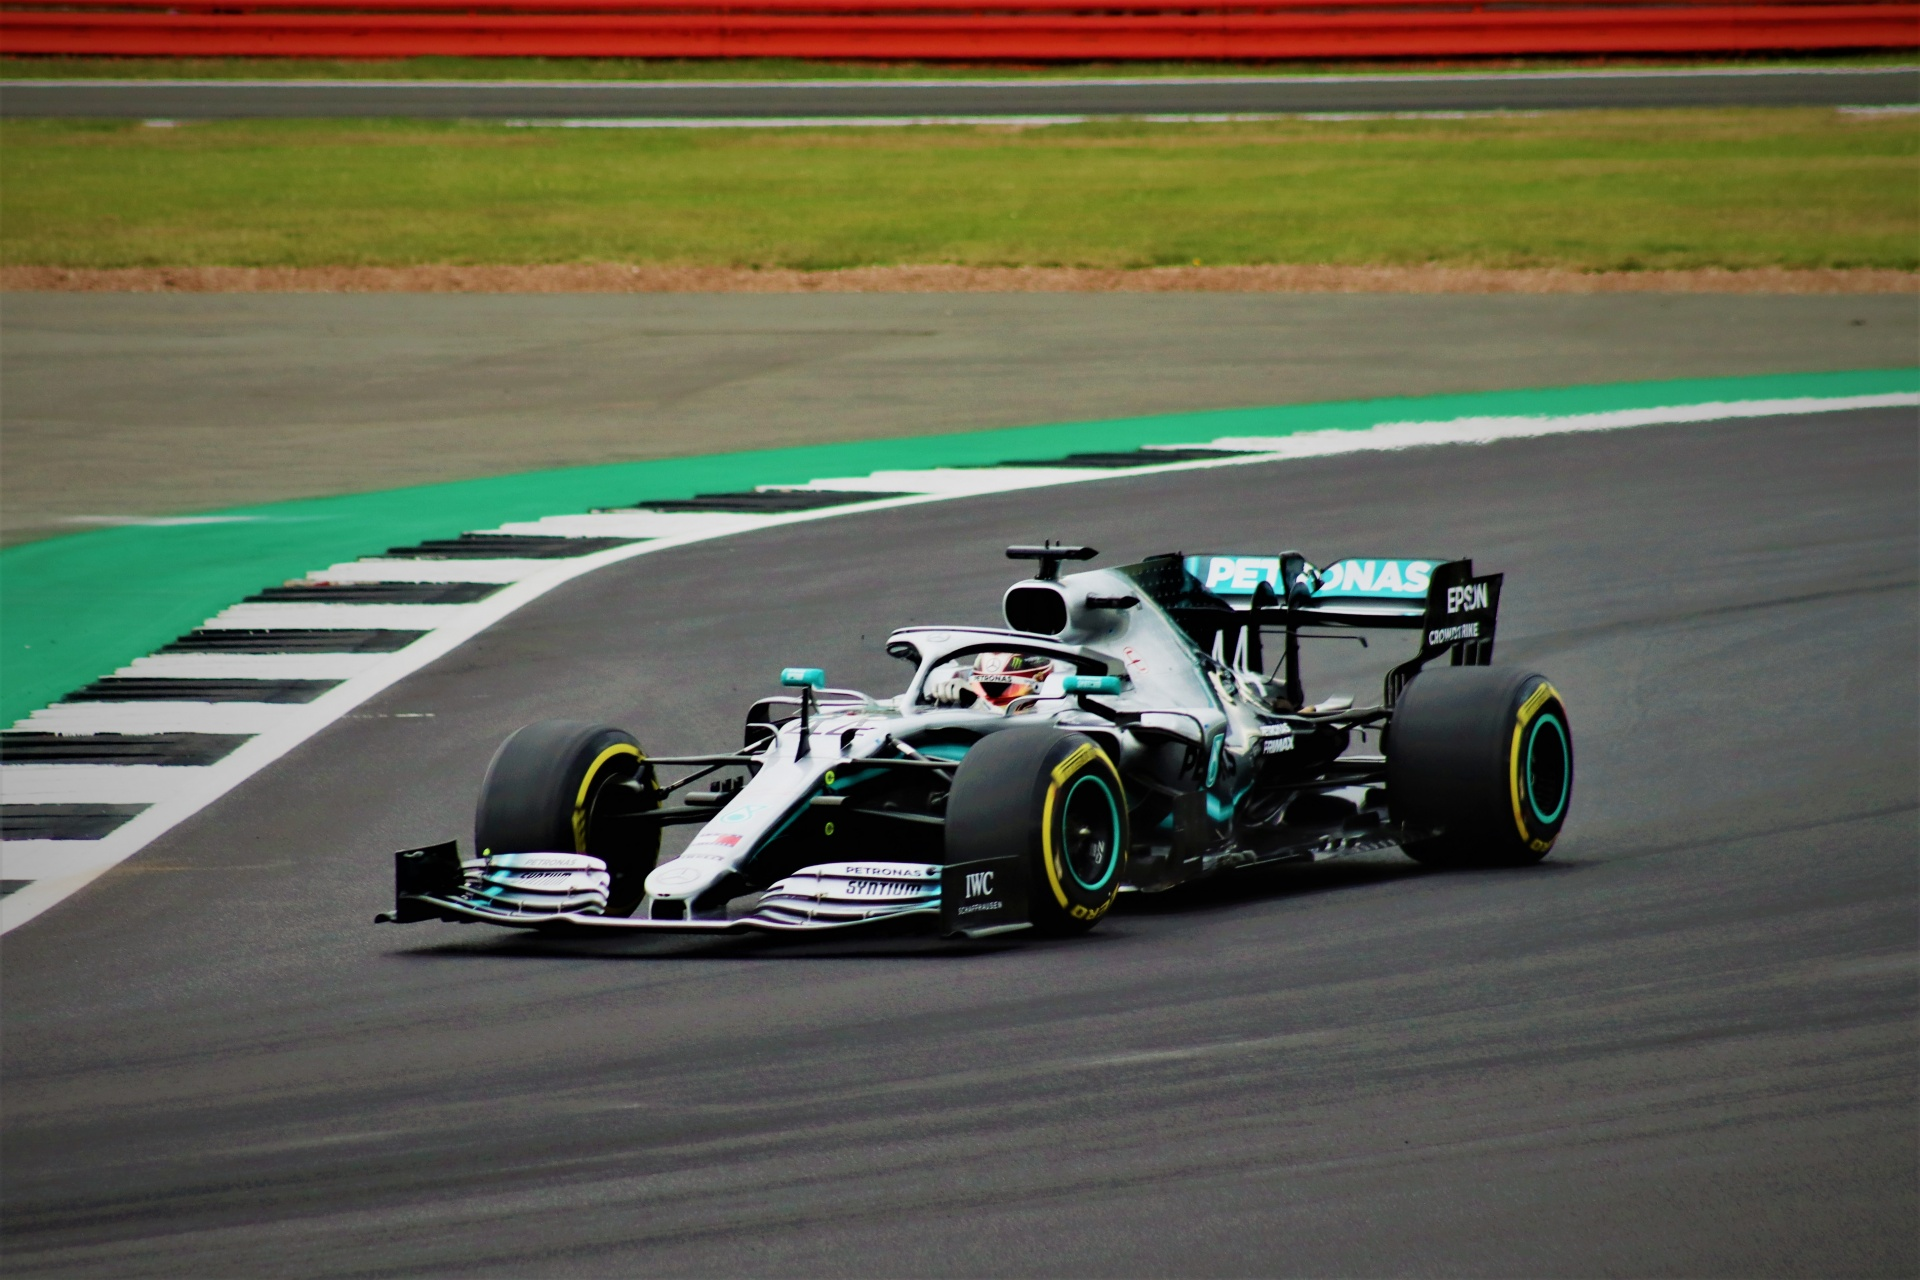 Vijfdaagse vliegreis – Grand Prix Engeland – F1 Silverstone 2021